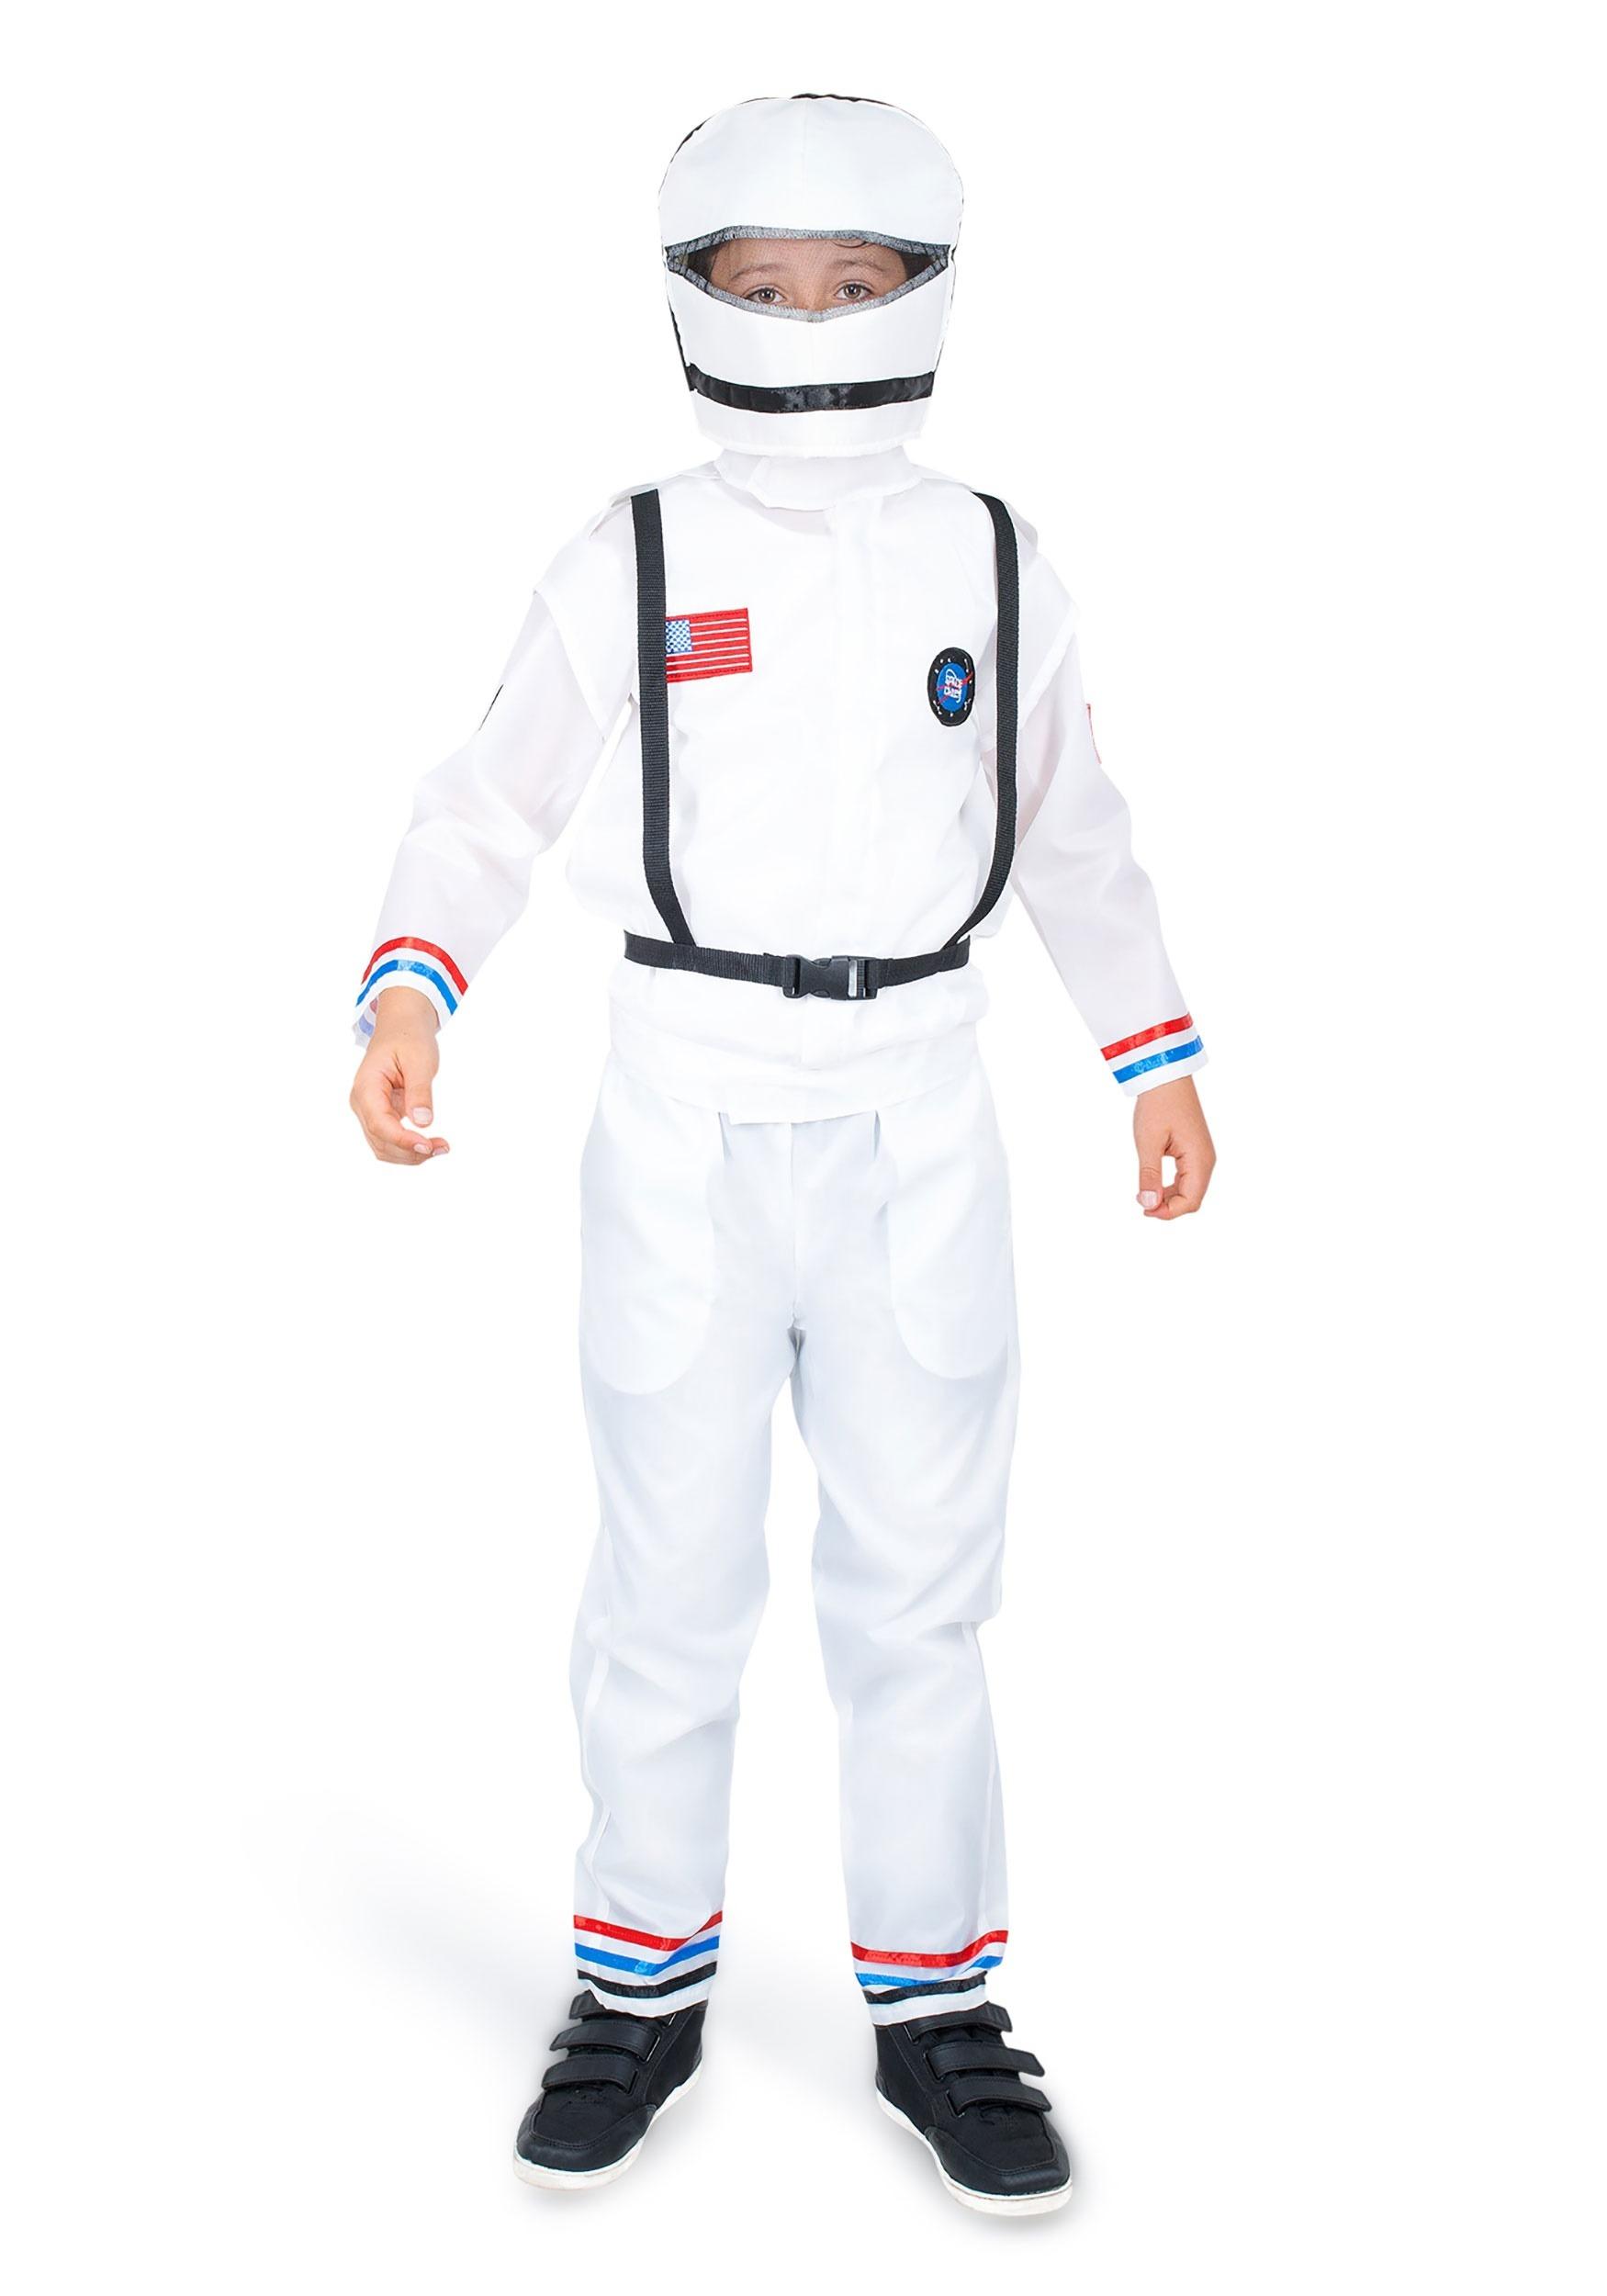 373cb701daa4 Space Astronaut Costume for a Boy